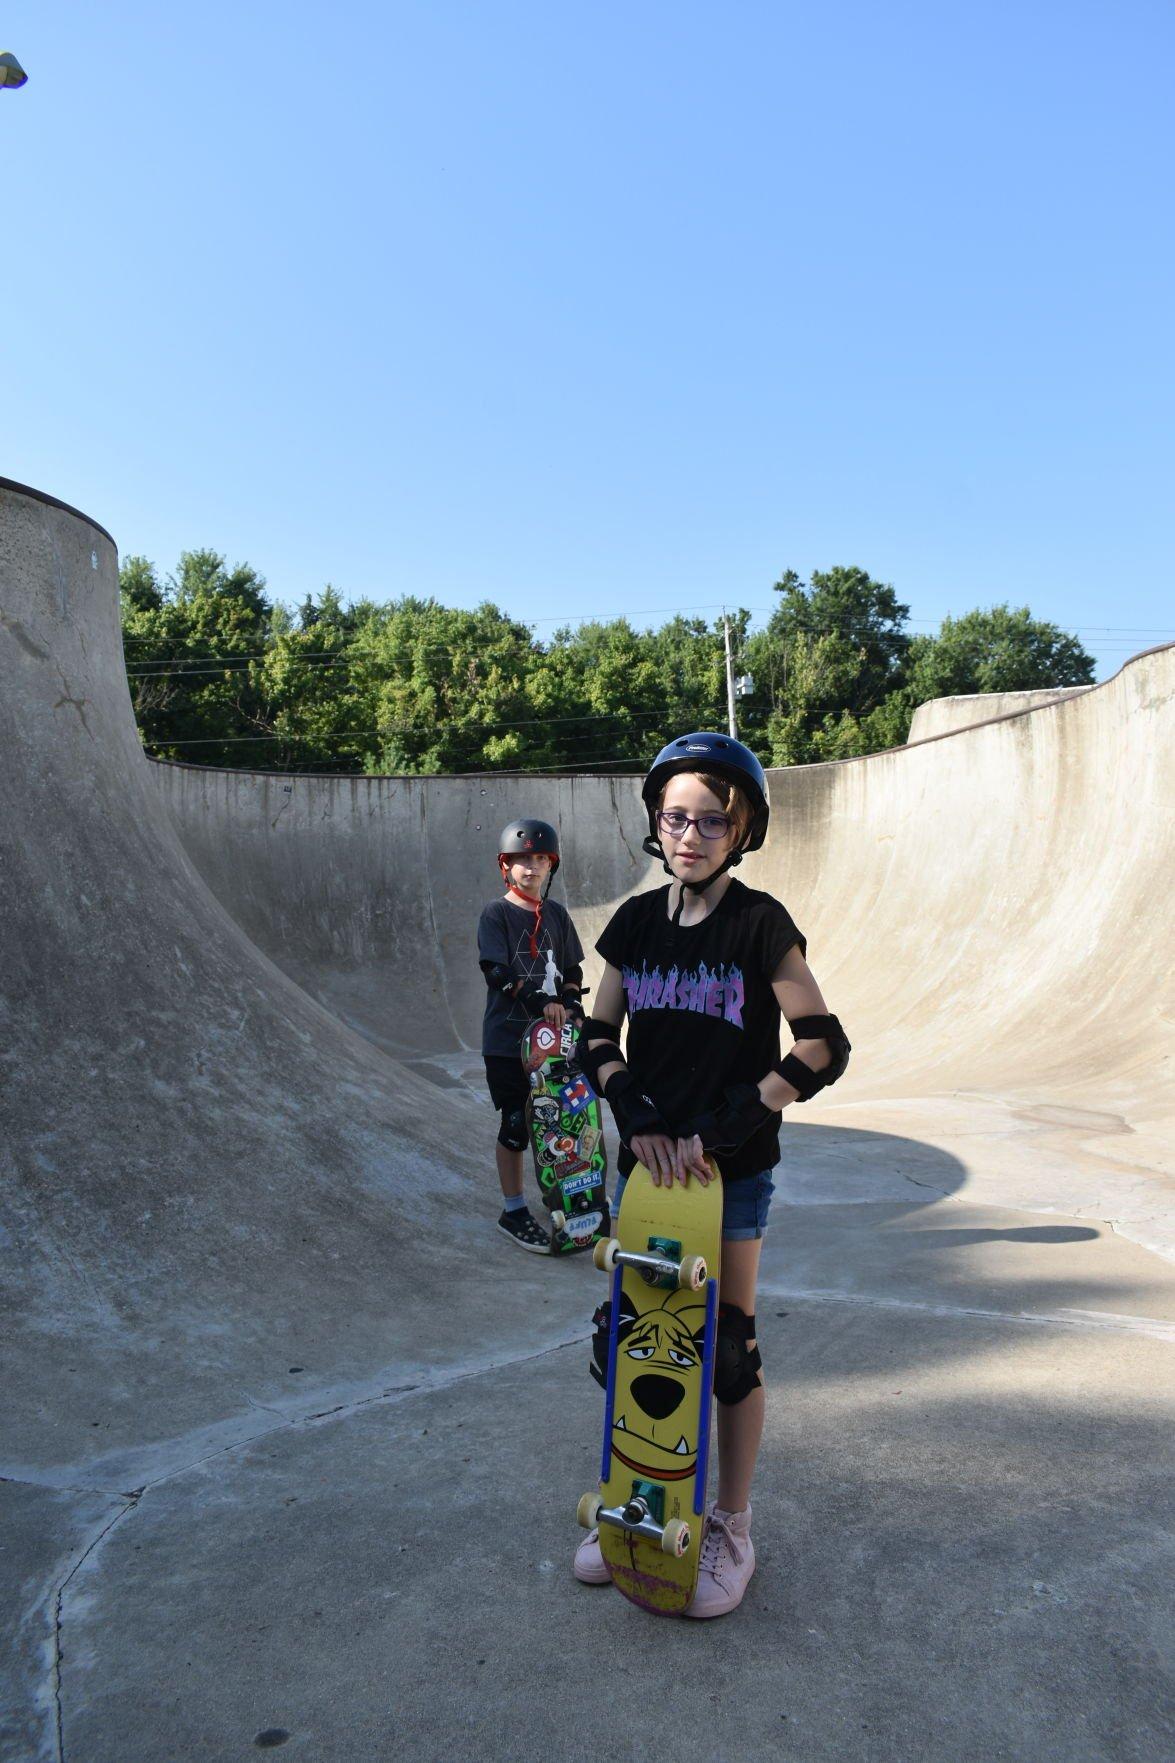 Skate camp kids